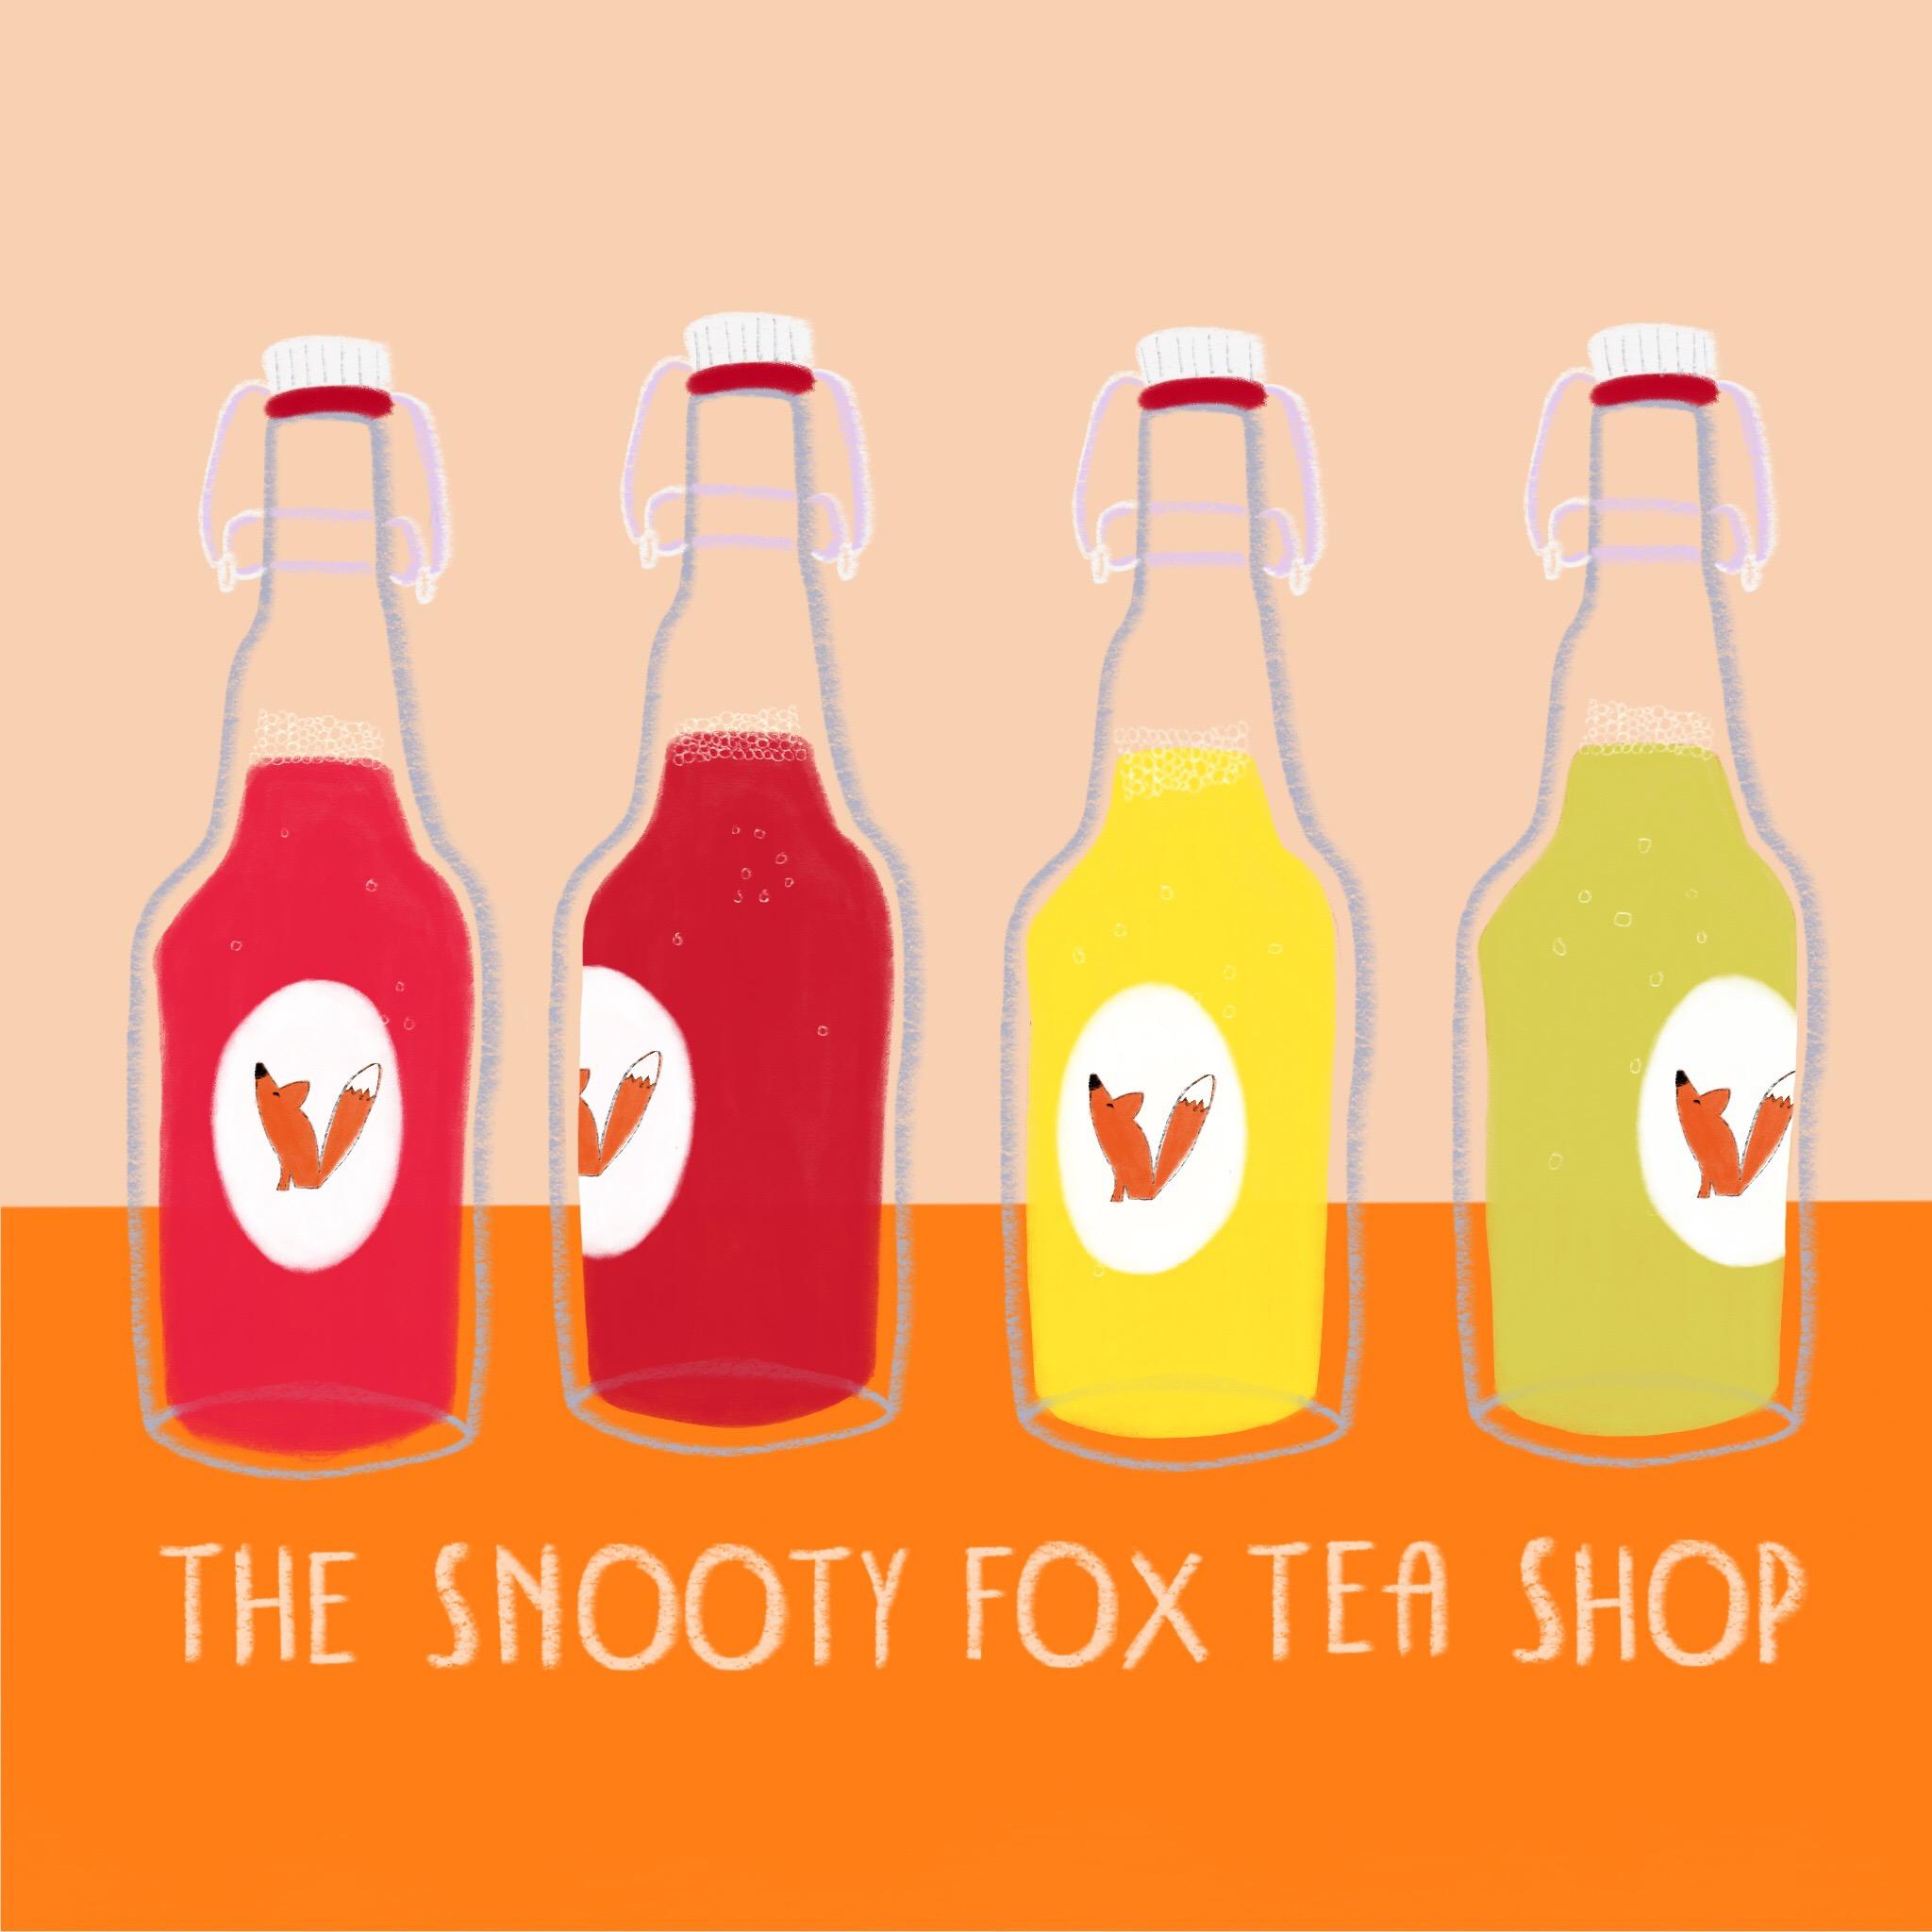 14_-_The_Snooty_Fox_Tea_Shop.jpg